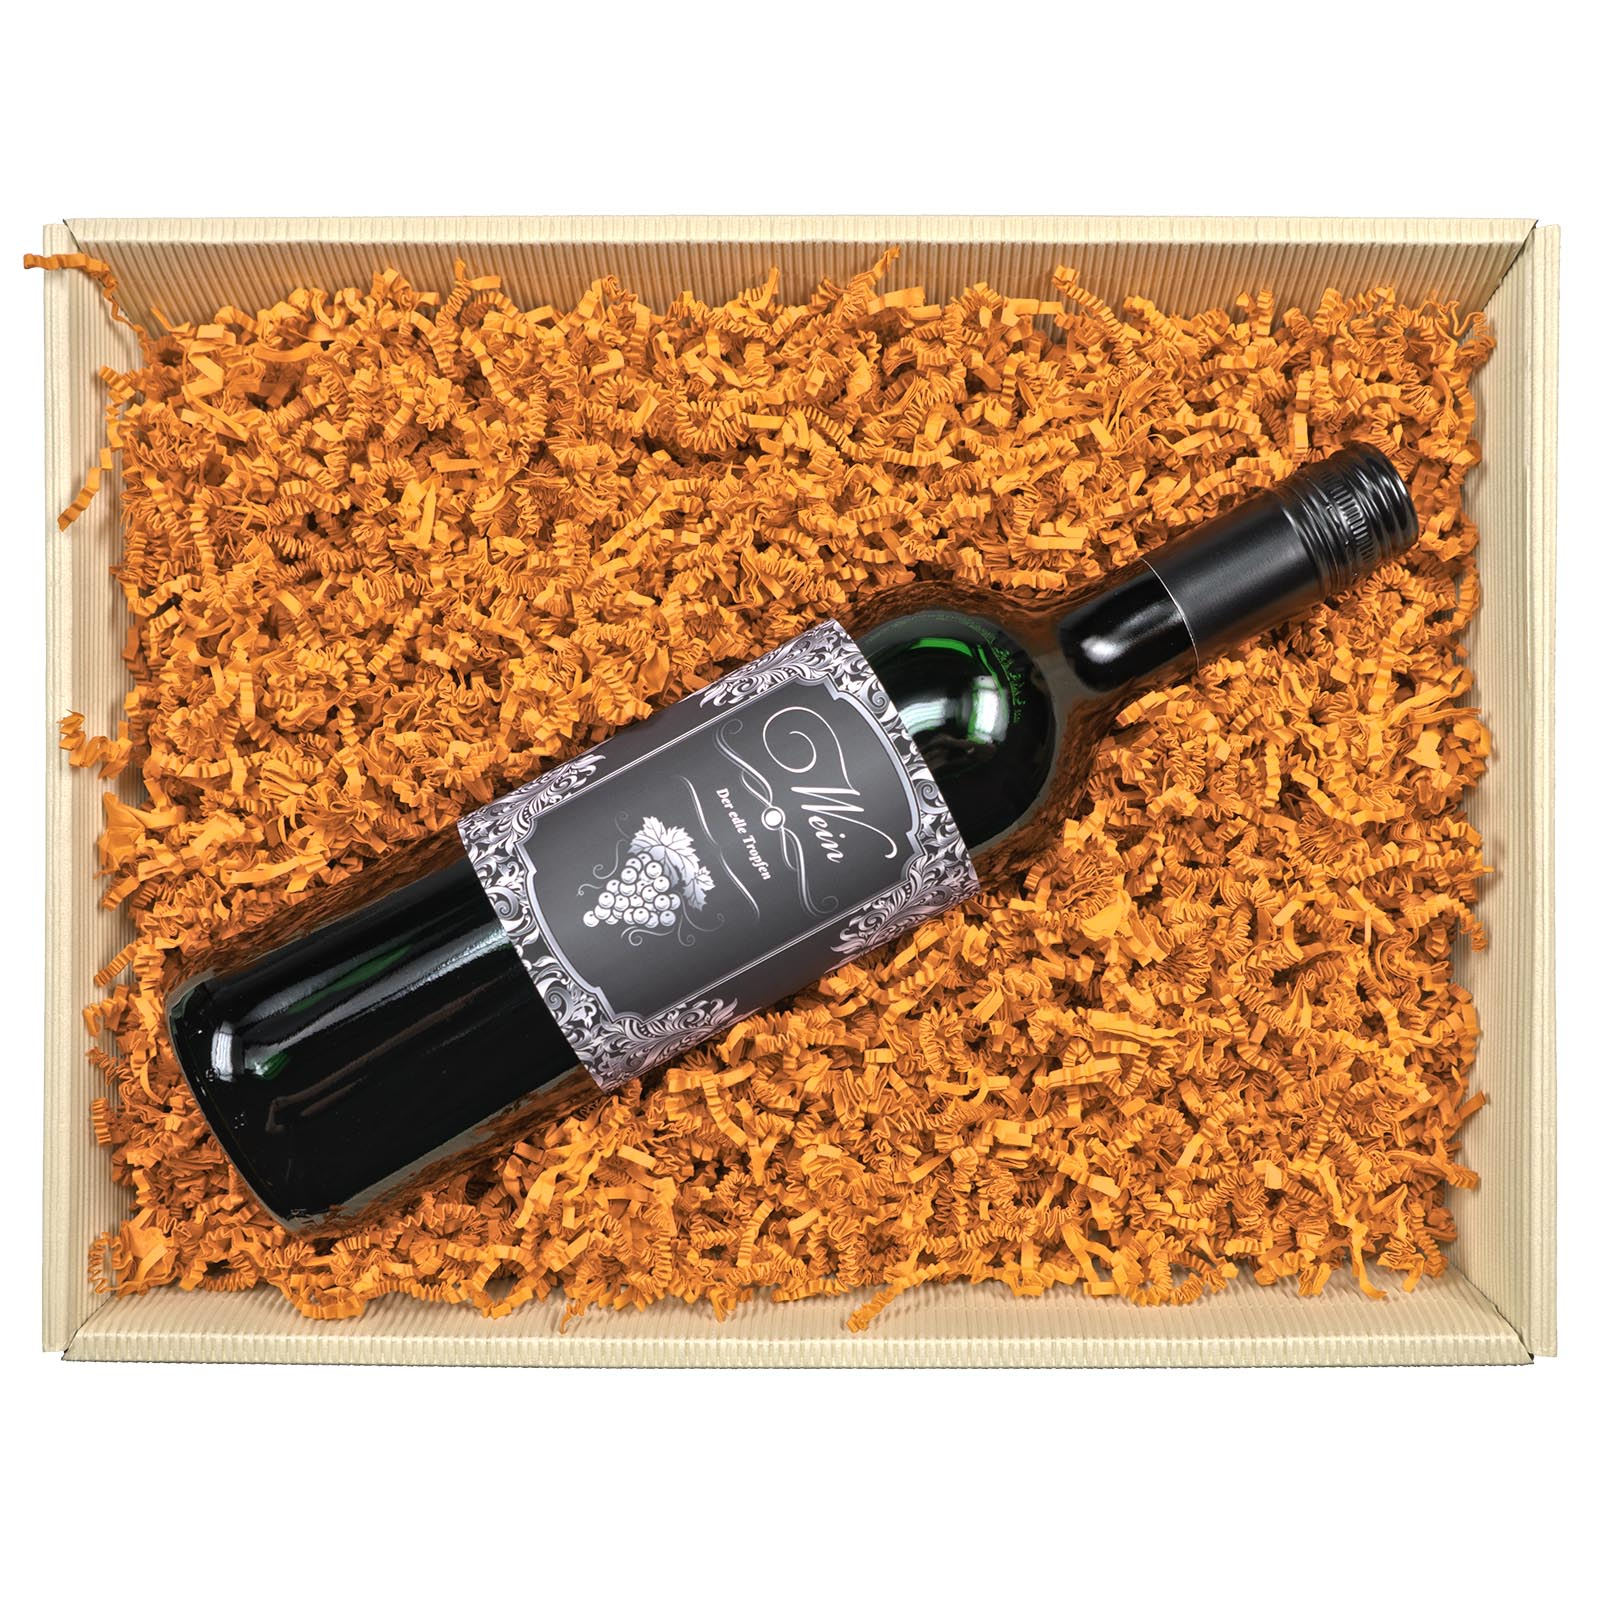 Sizzlepak 10 kg cognac holzwolle sizzlepak sizzlefine for Restposten dekoartikel